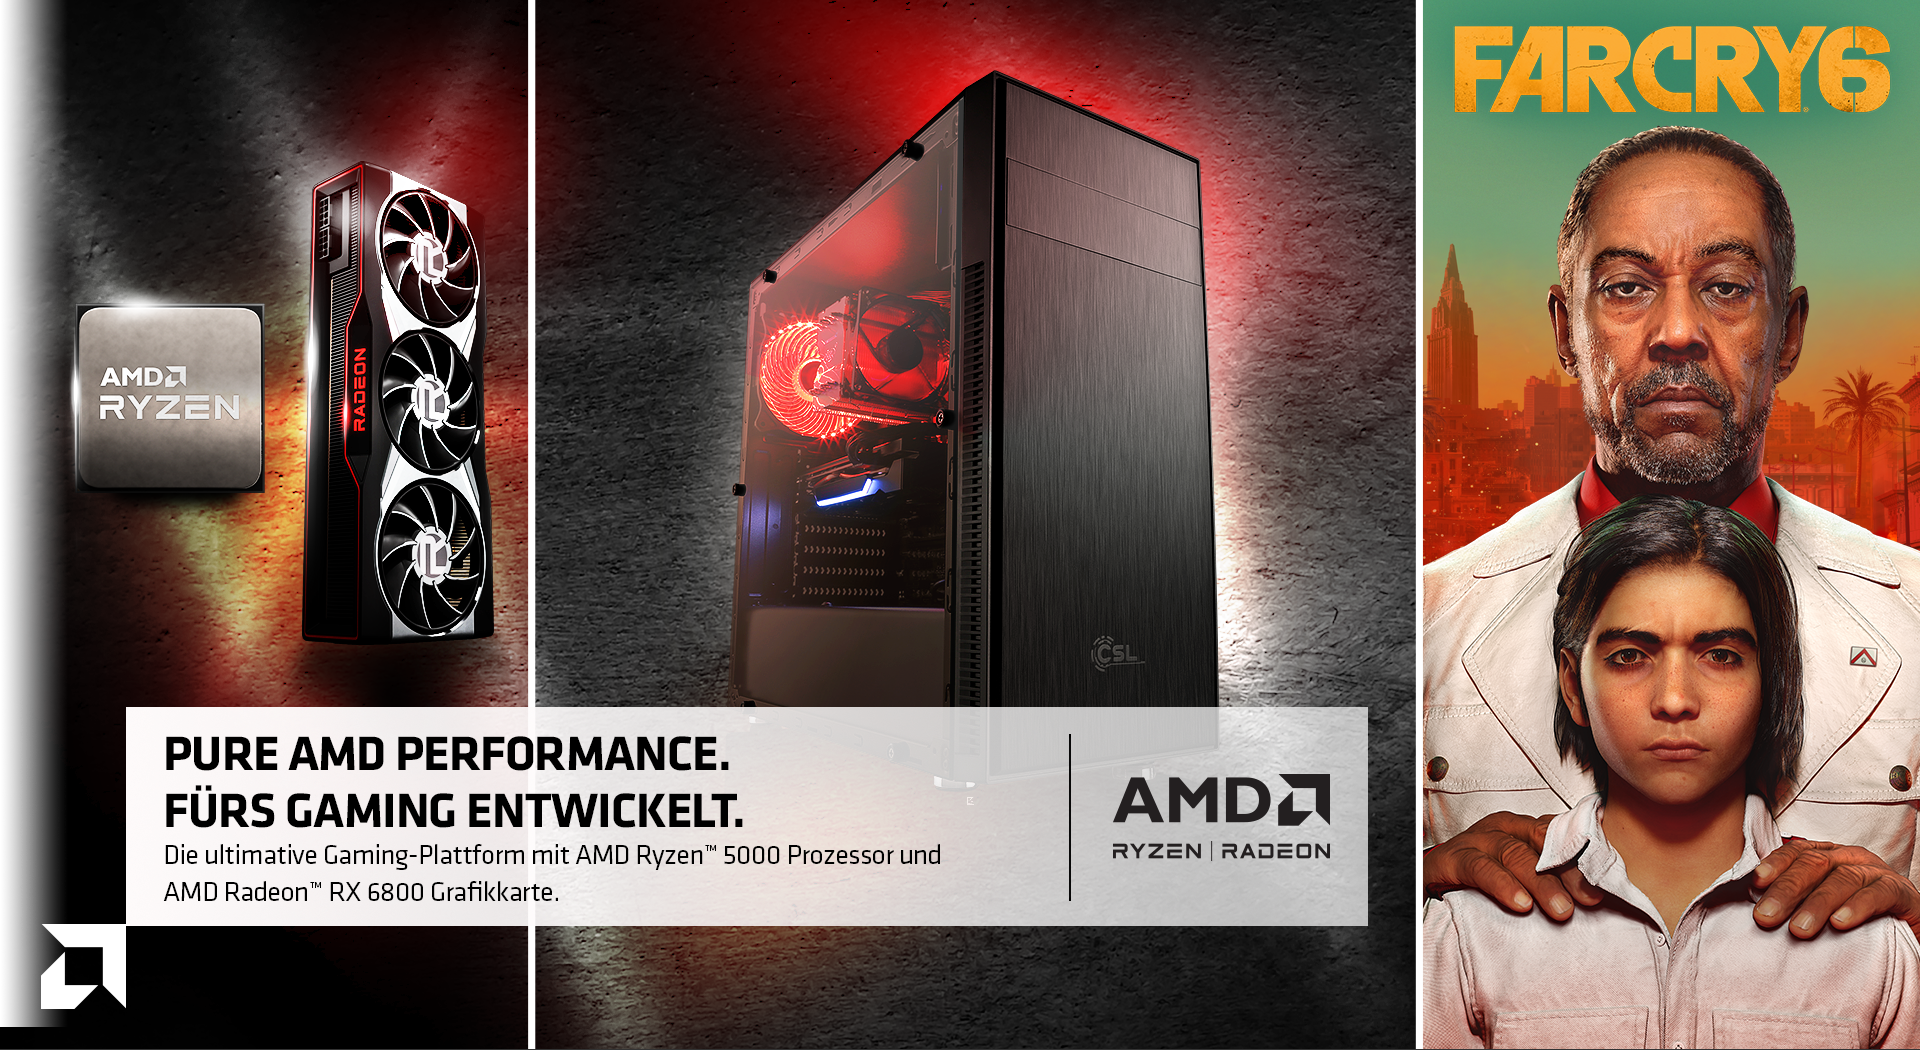 AMD Ryzen Radeon